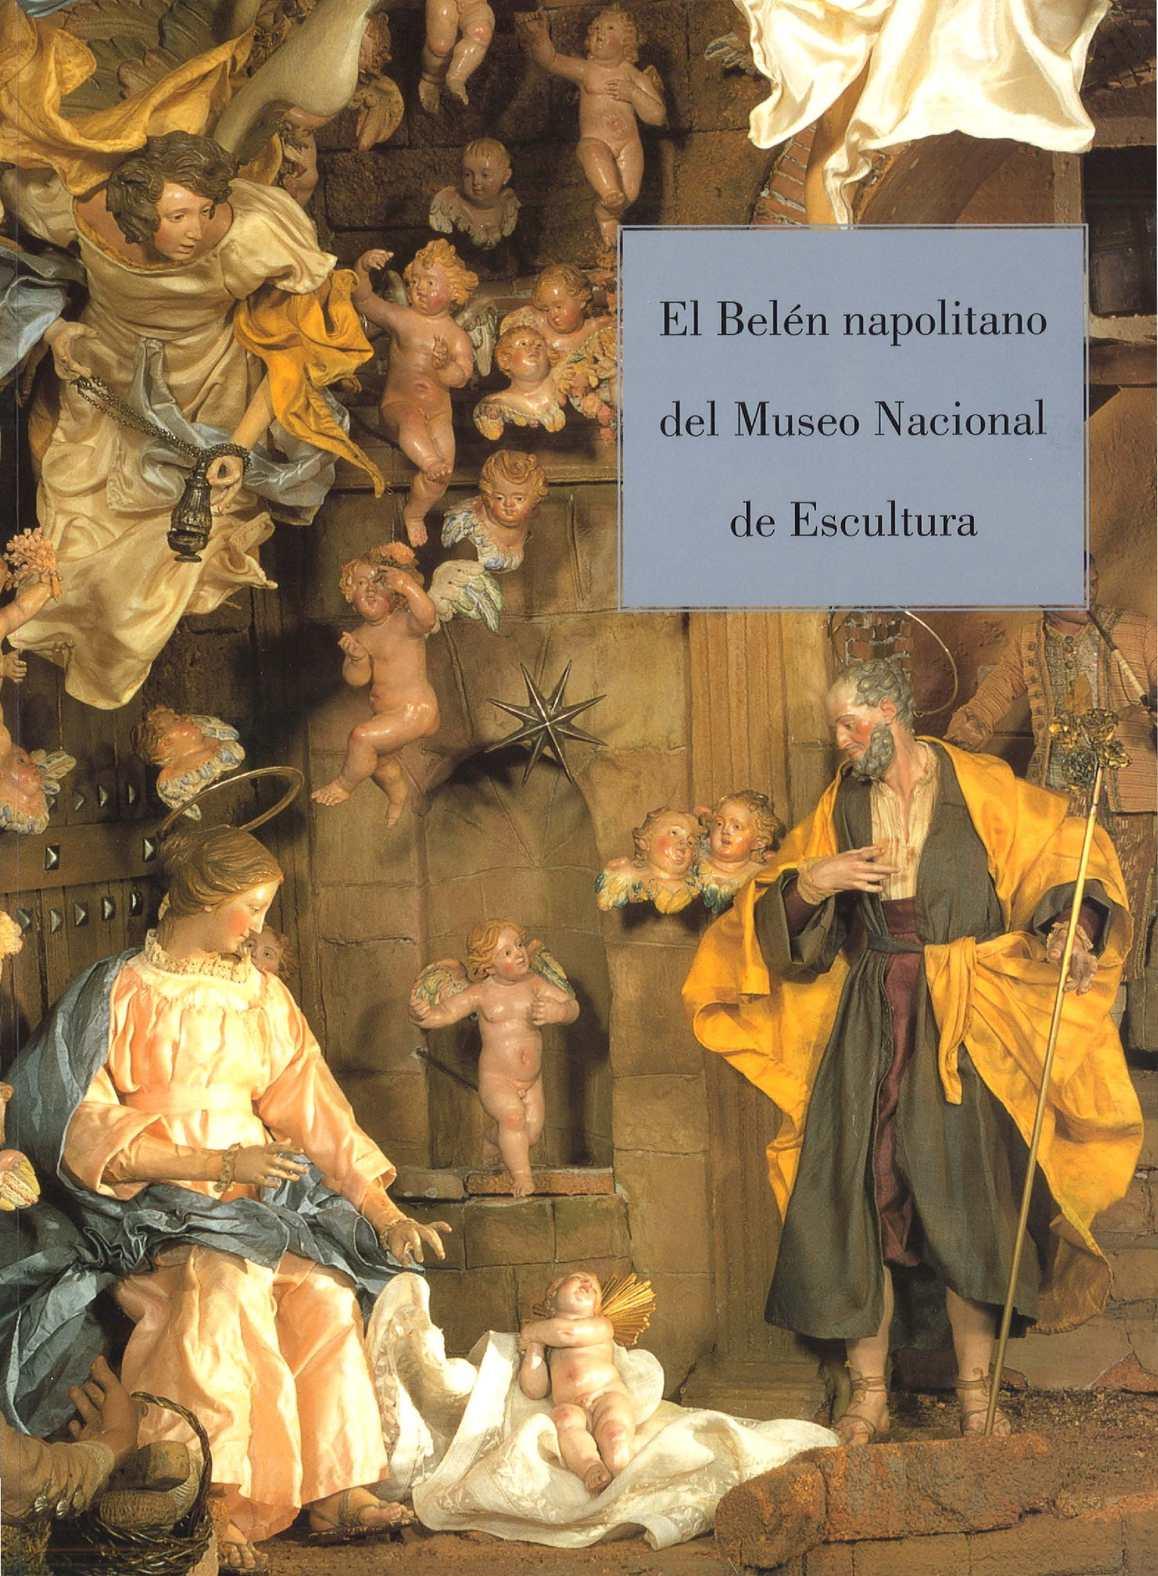 Belén Napolitano del Museo Nacional de Escultura